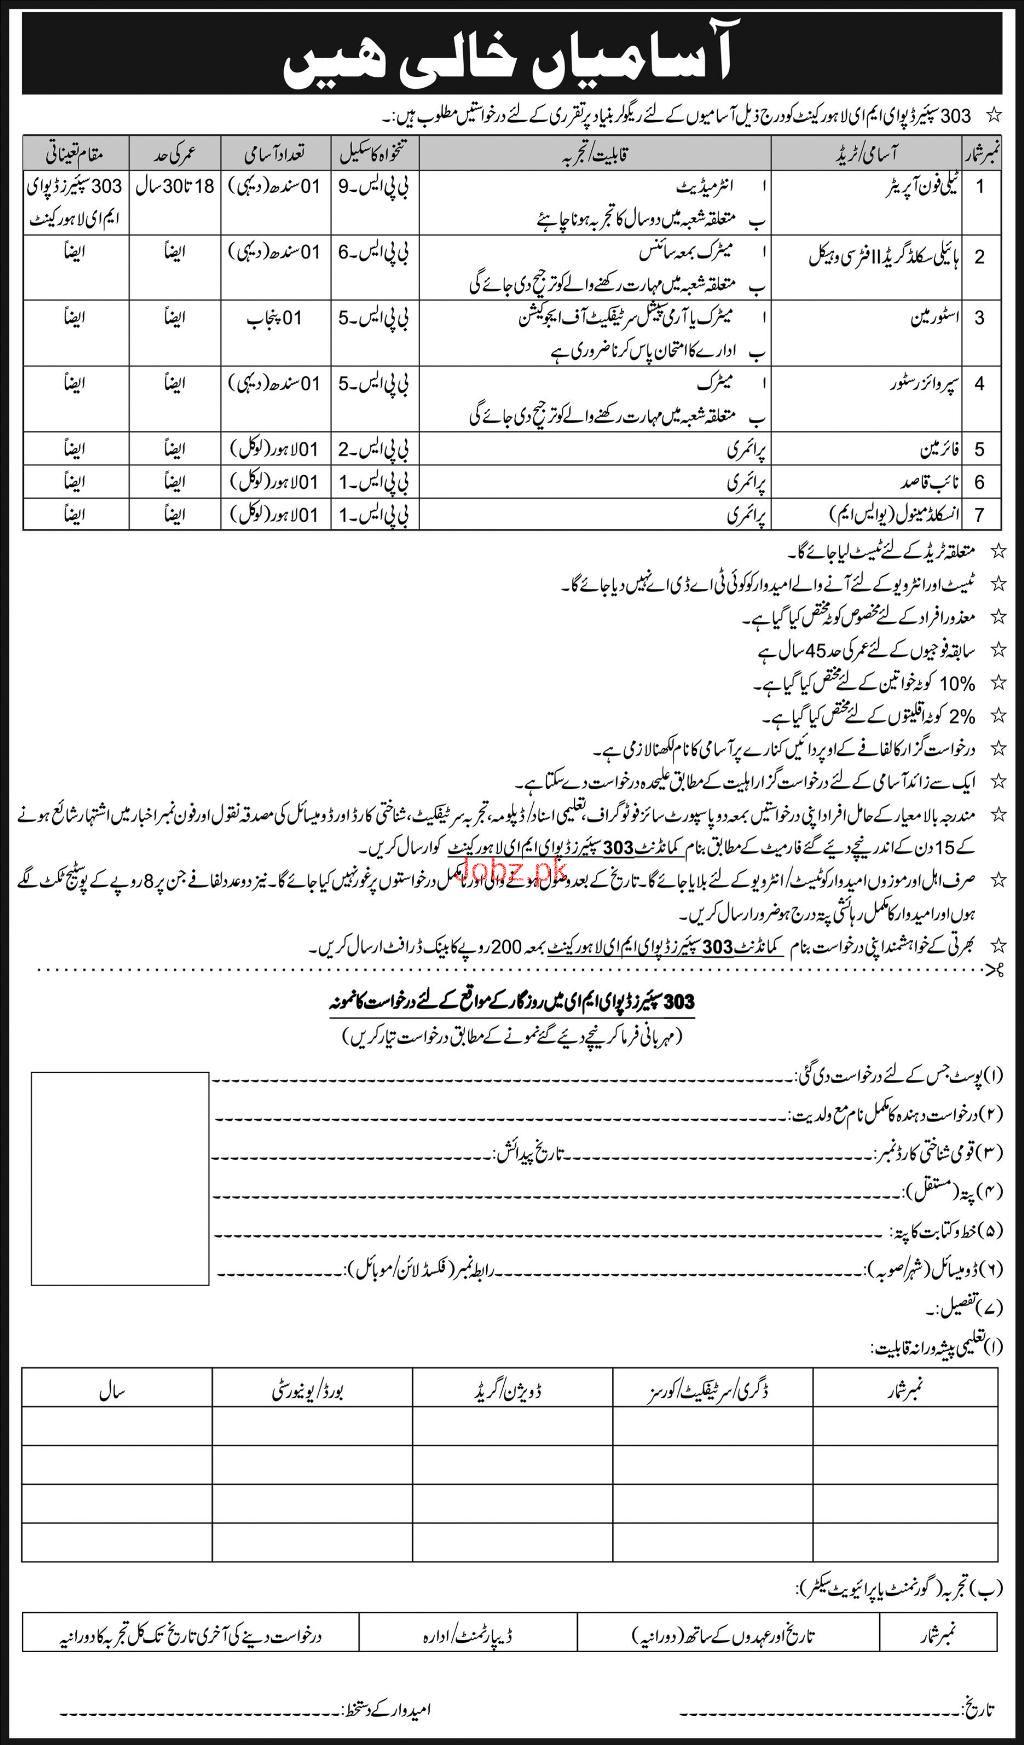 303 Spares Depot EME Lahore Telephone Operator Jobs